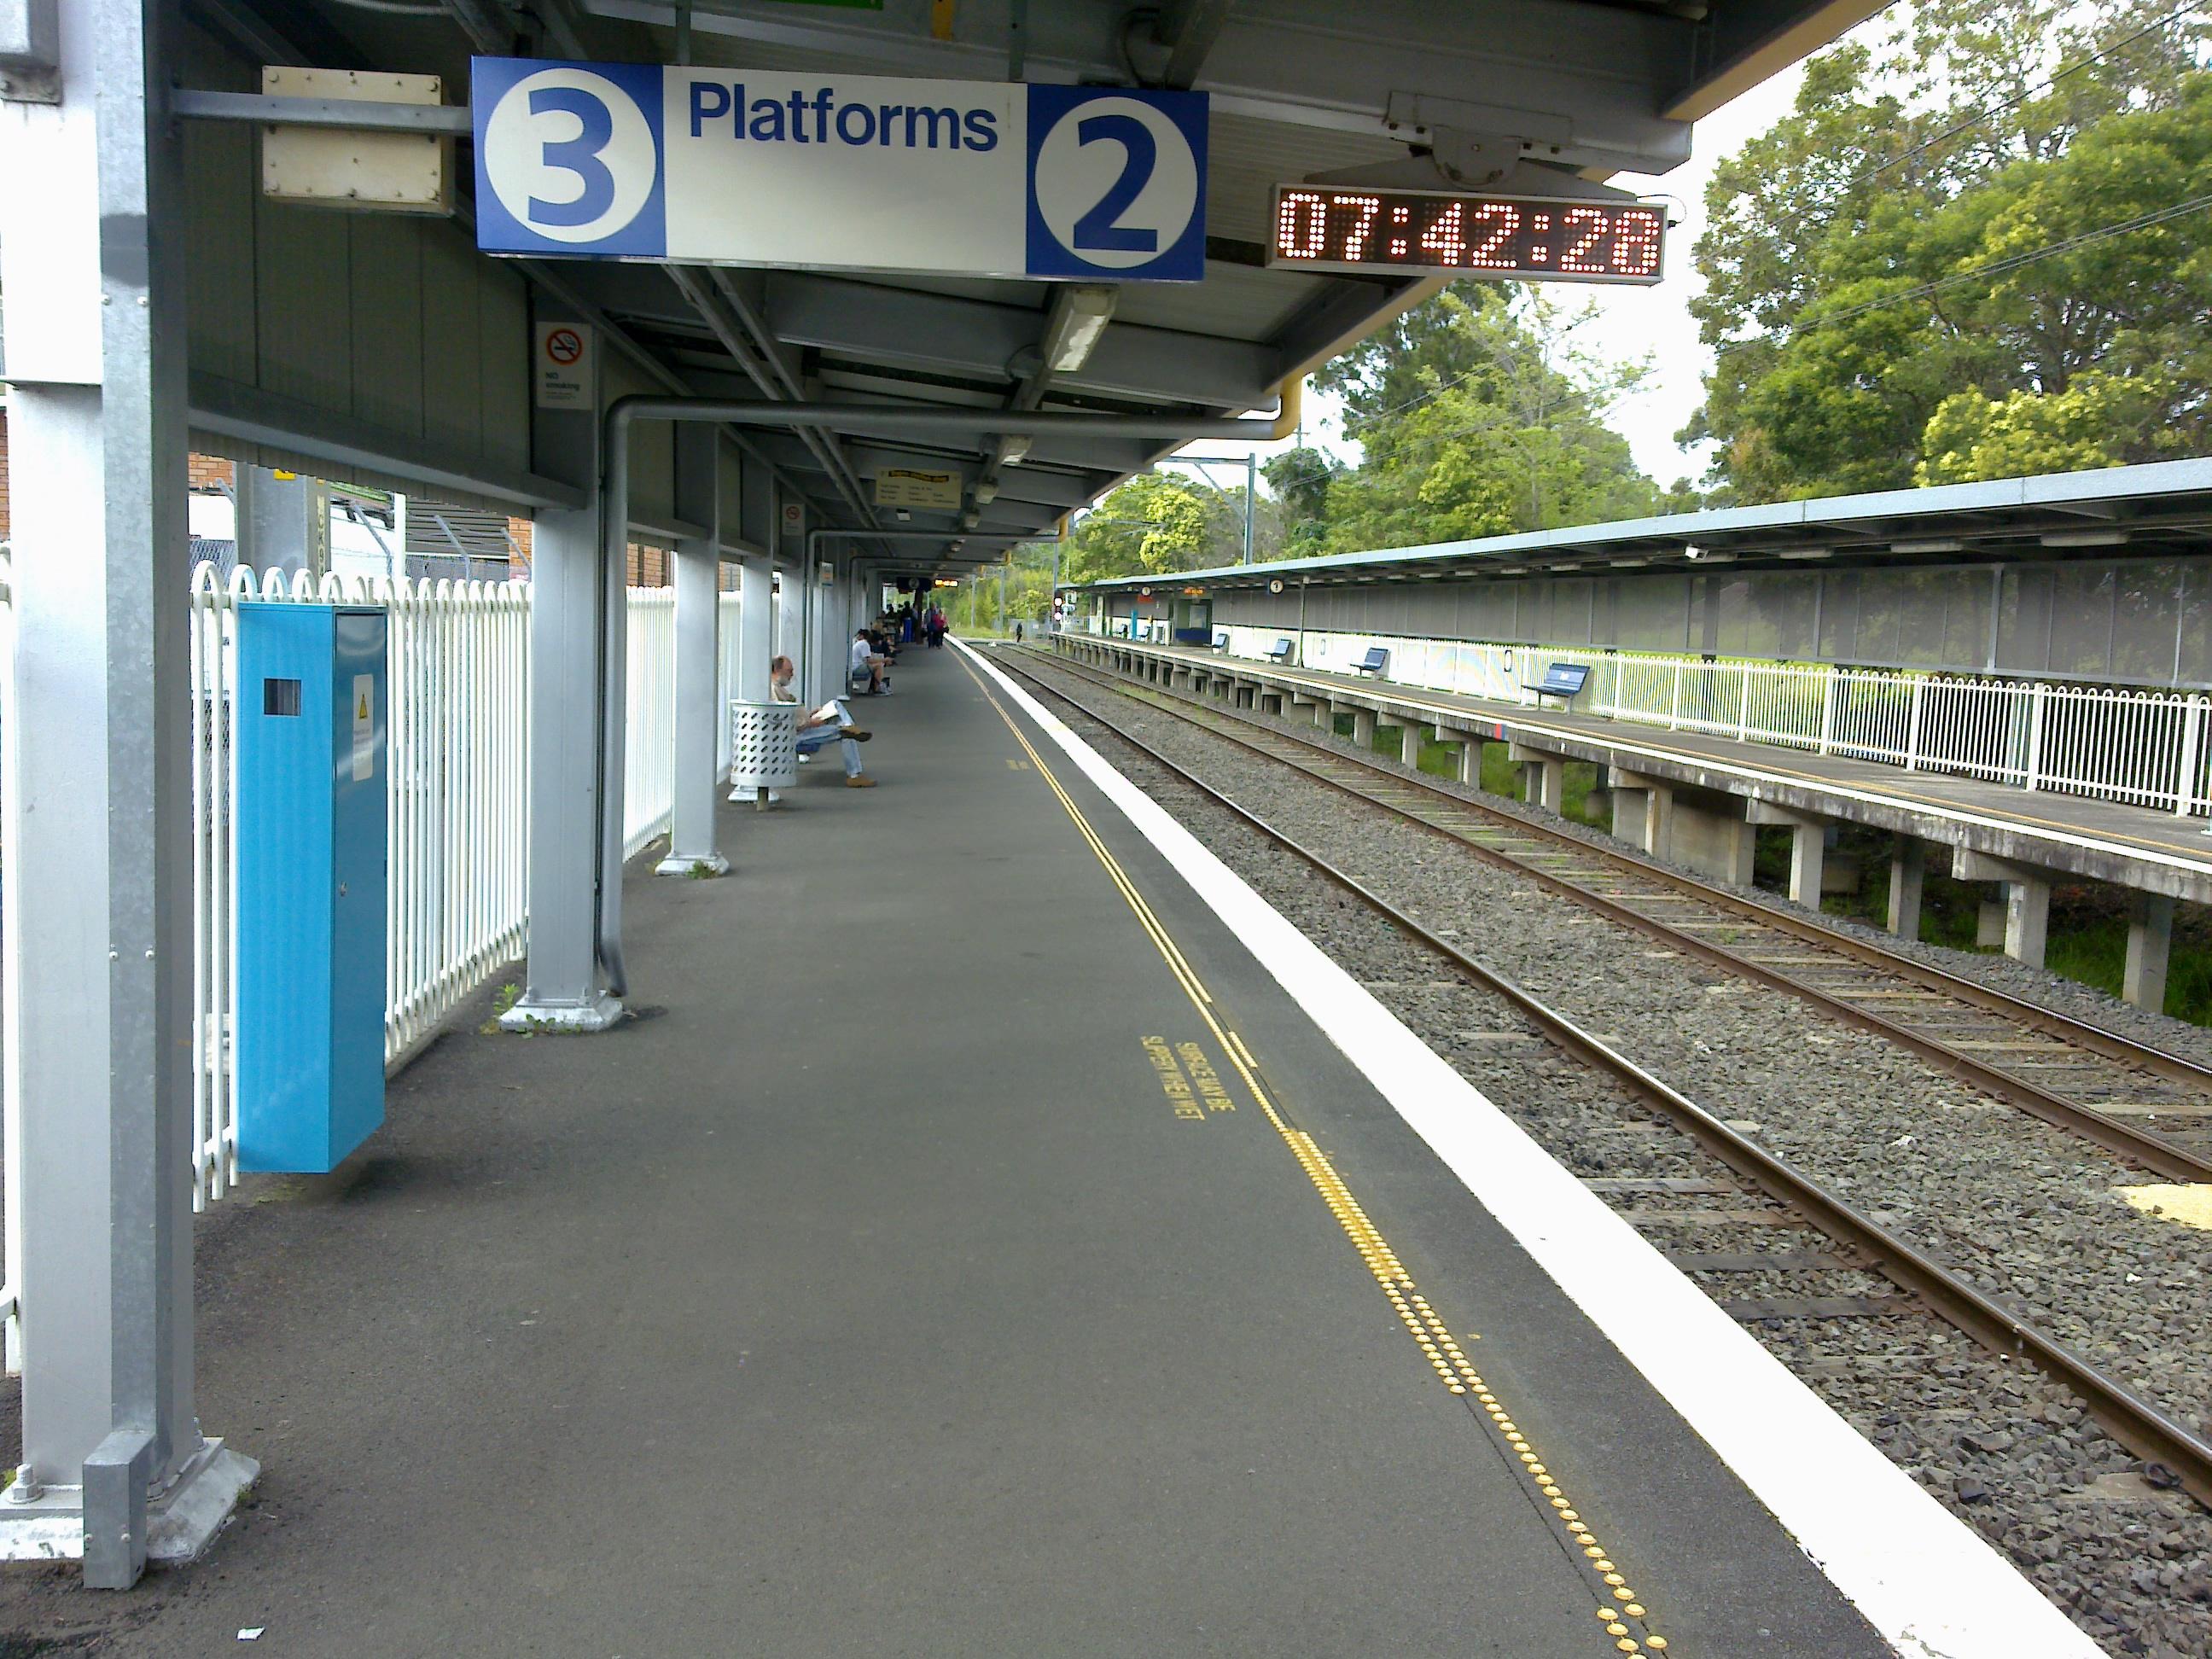 0547406d2 File:Dapto Station Platforms 2 and 3.jpg - Wikimedia Commons